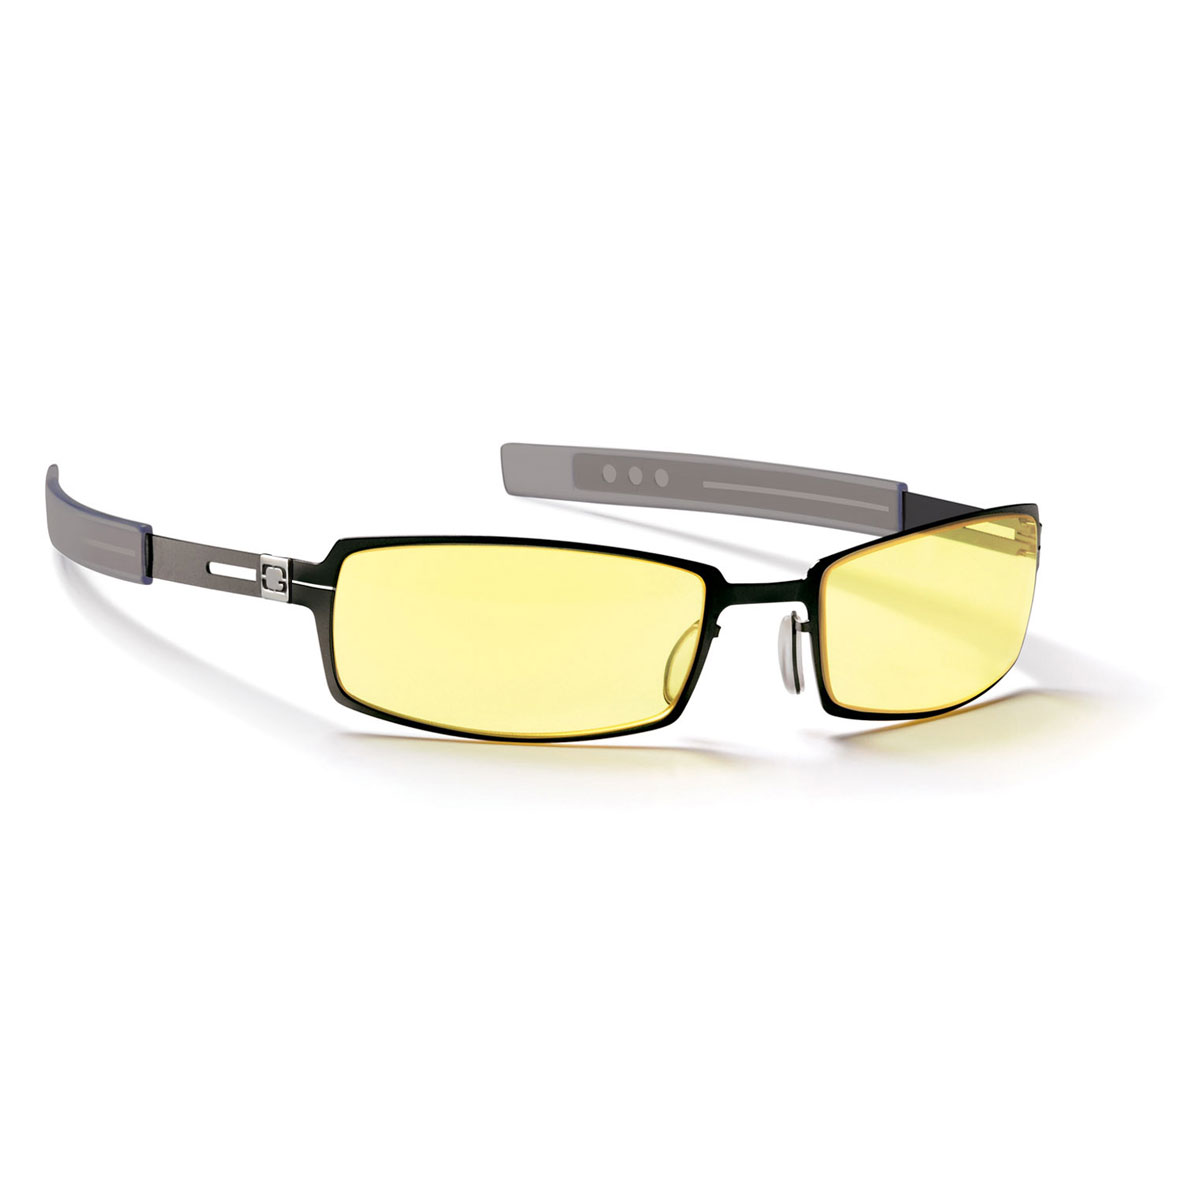 gunnar lunettes gamer ppk onyx mercury lunettes de protection gunnar sur. Black Bedroom Furniture Sets. Home Design Ideas